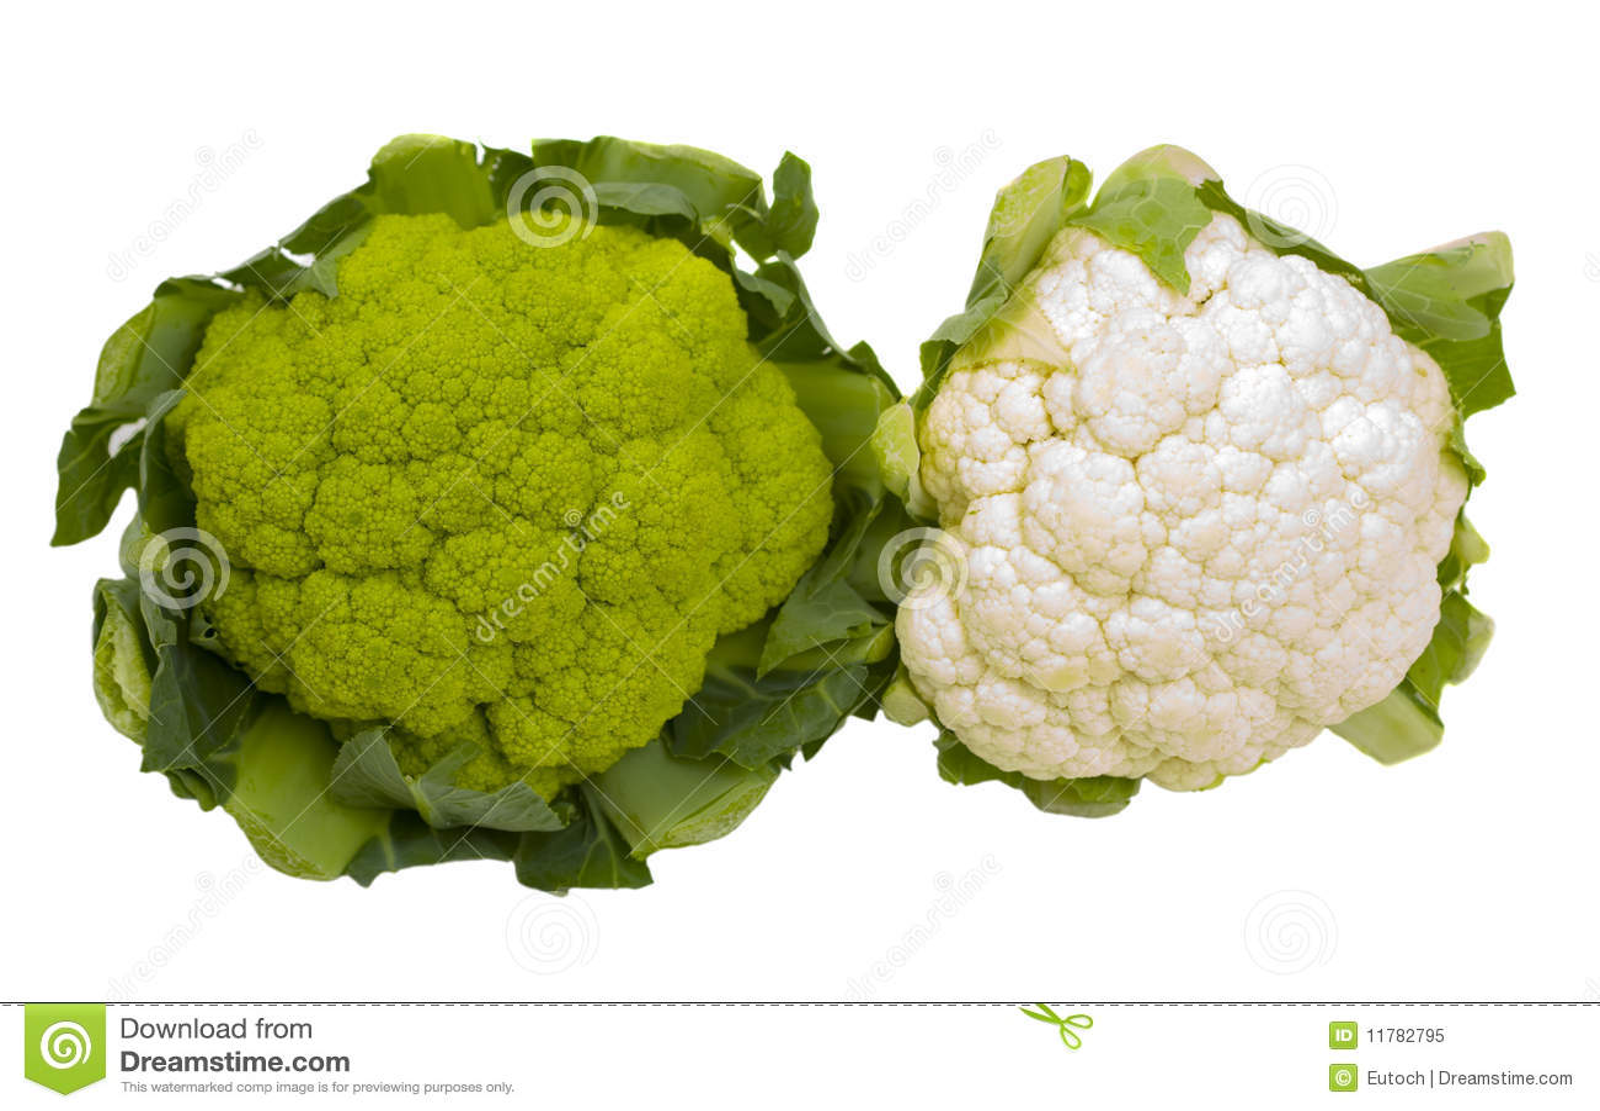 groene-en-witte-ge%C3%AFsoleerde-bloemko